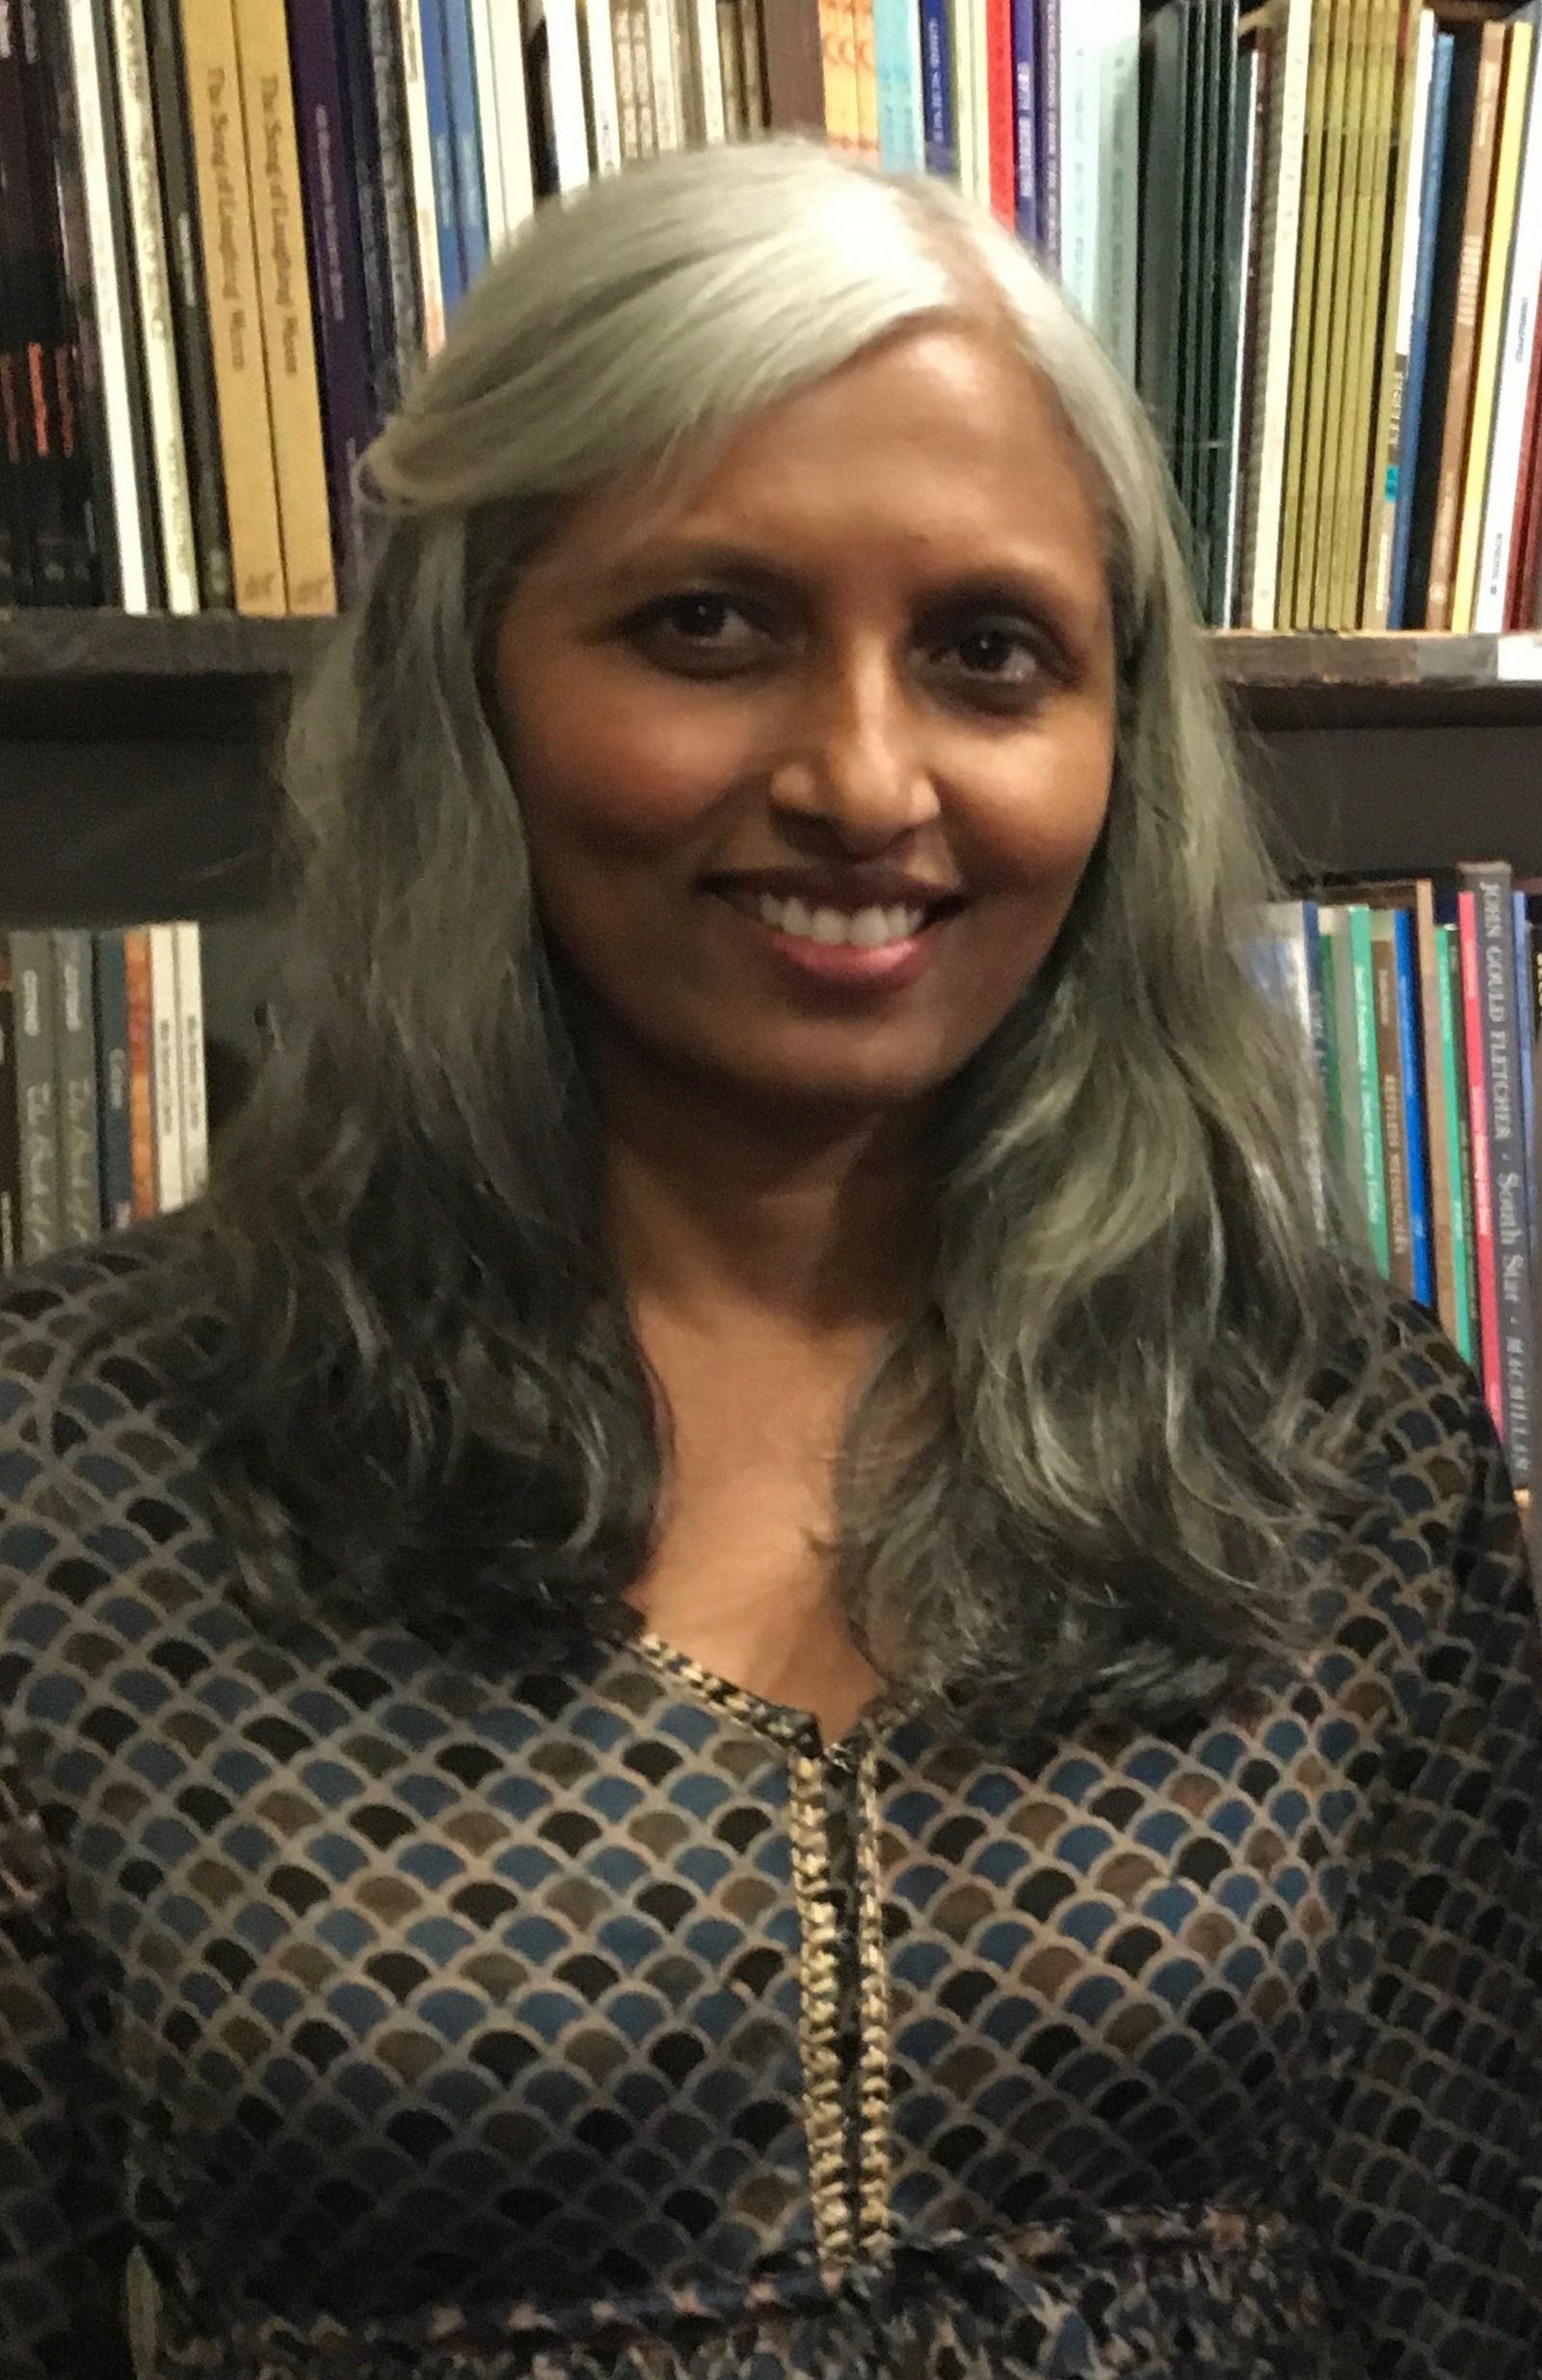 Subhashini Kaligotla